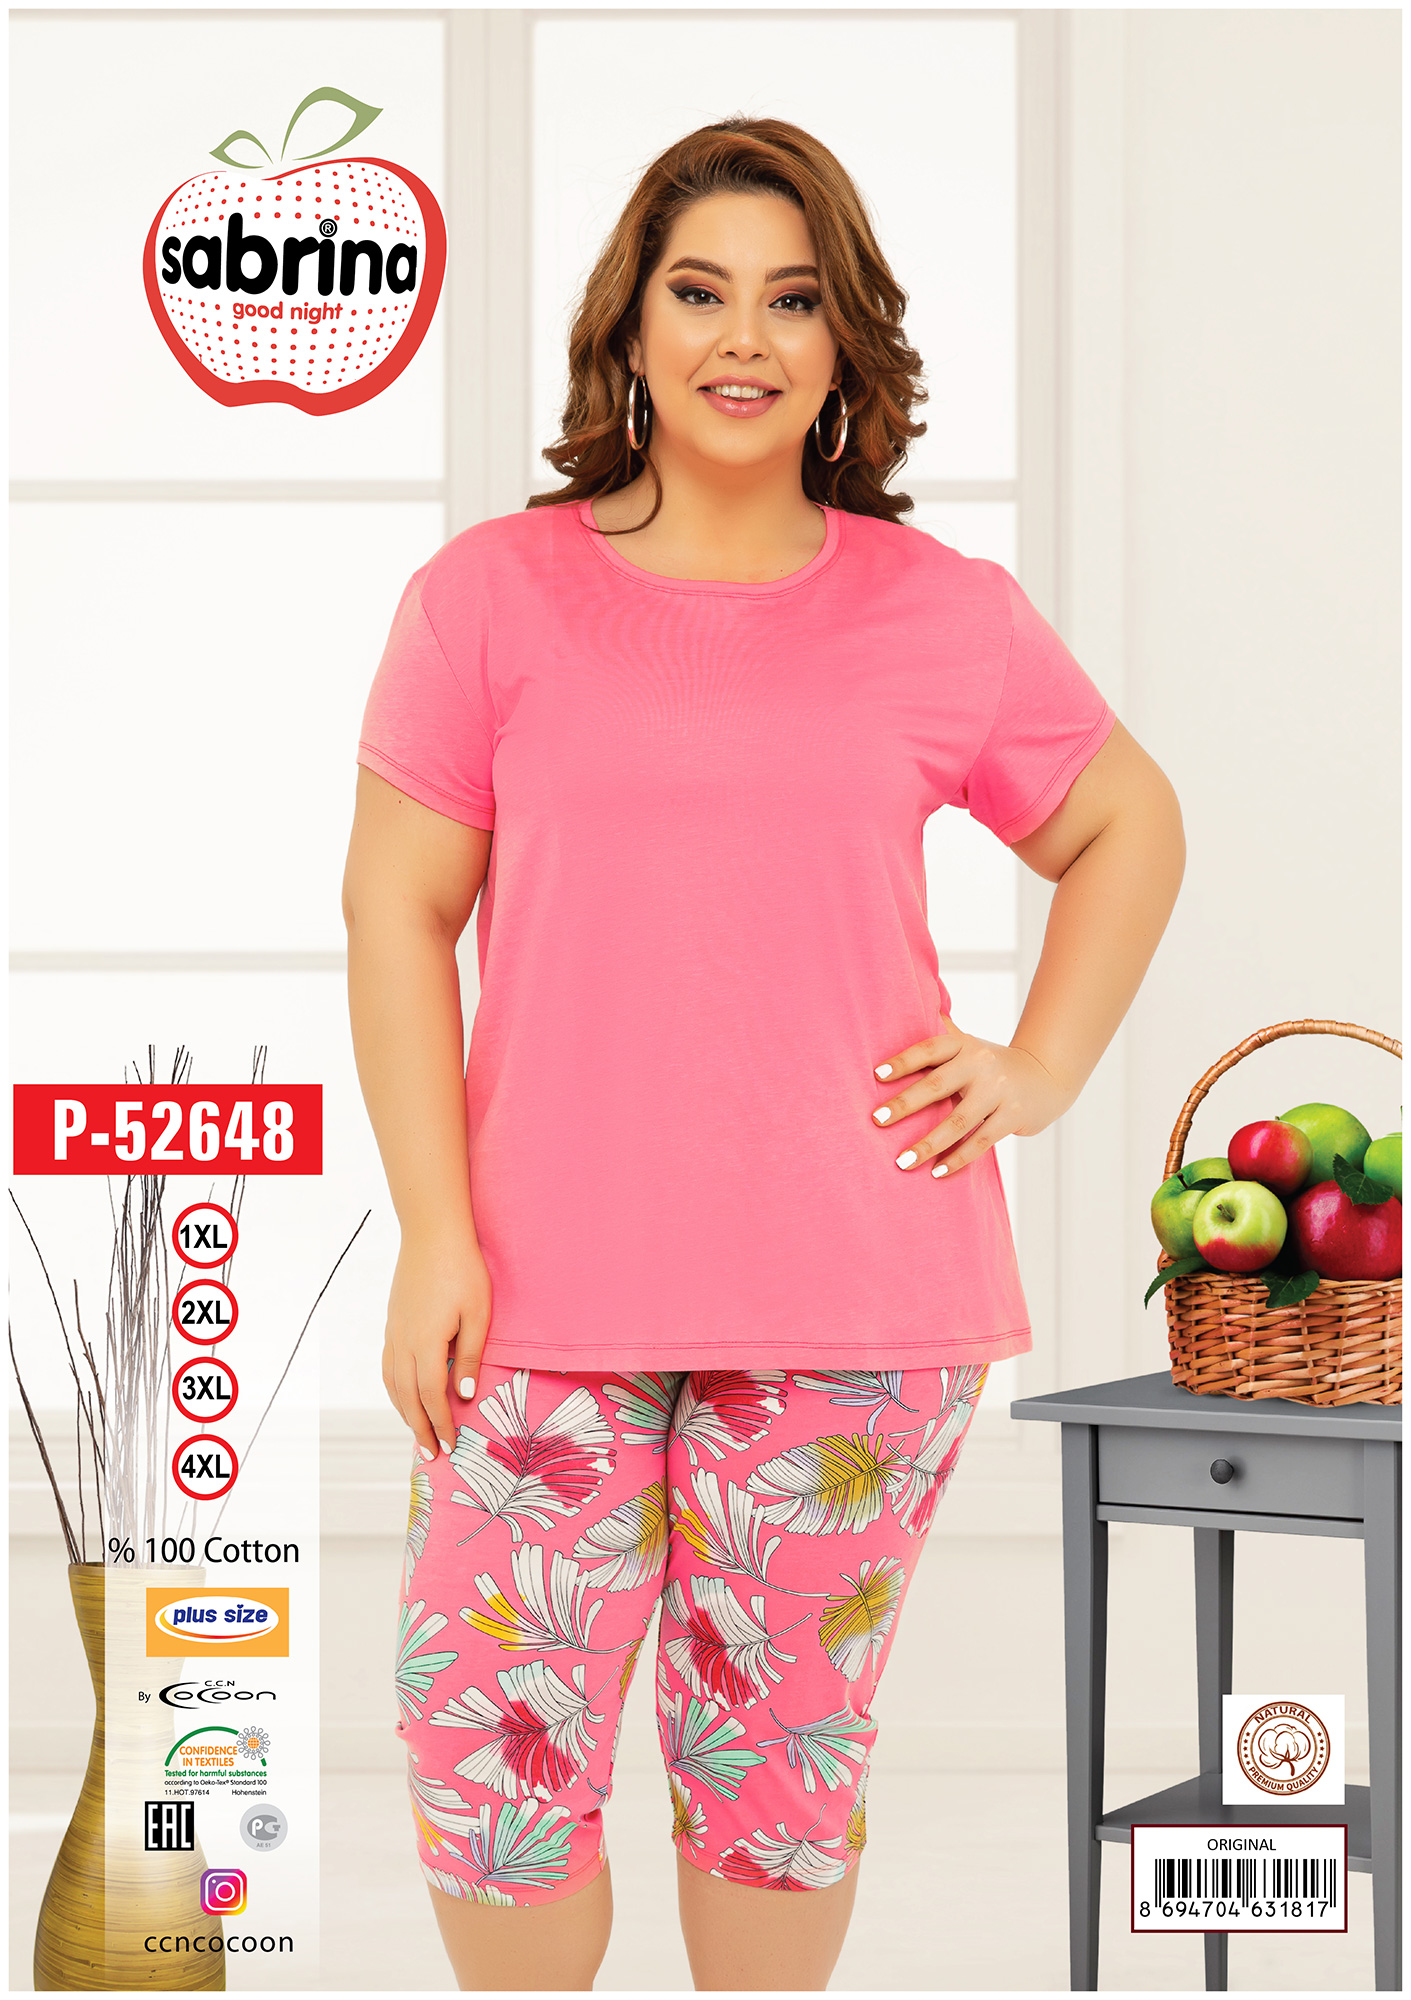 Комплект (футболка, бриджи) P-52648 Sabrina